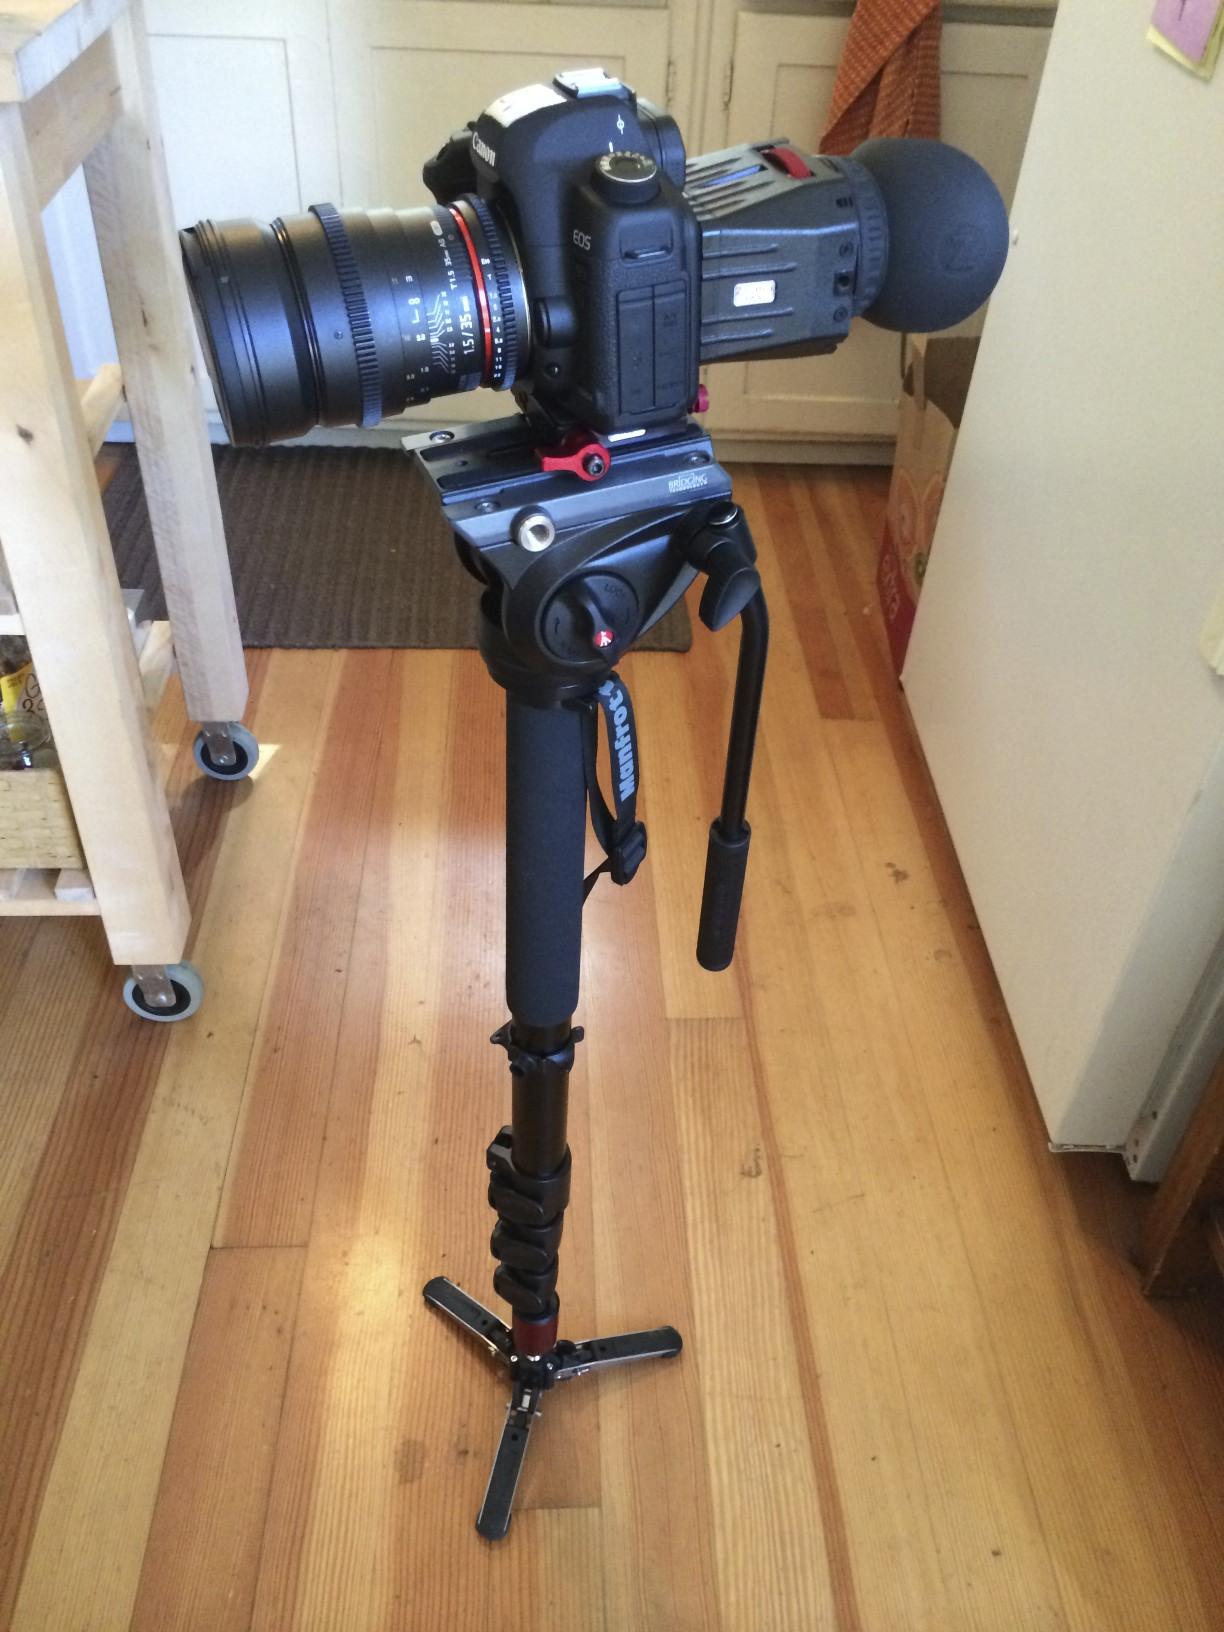 The main filming apparatus.